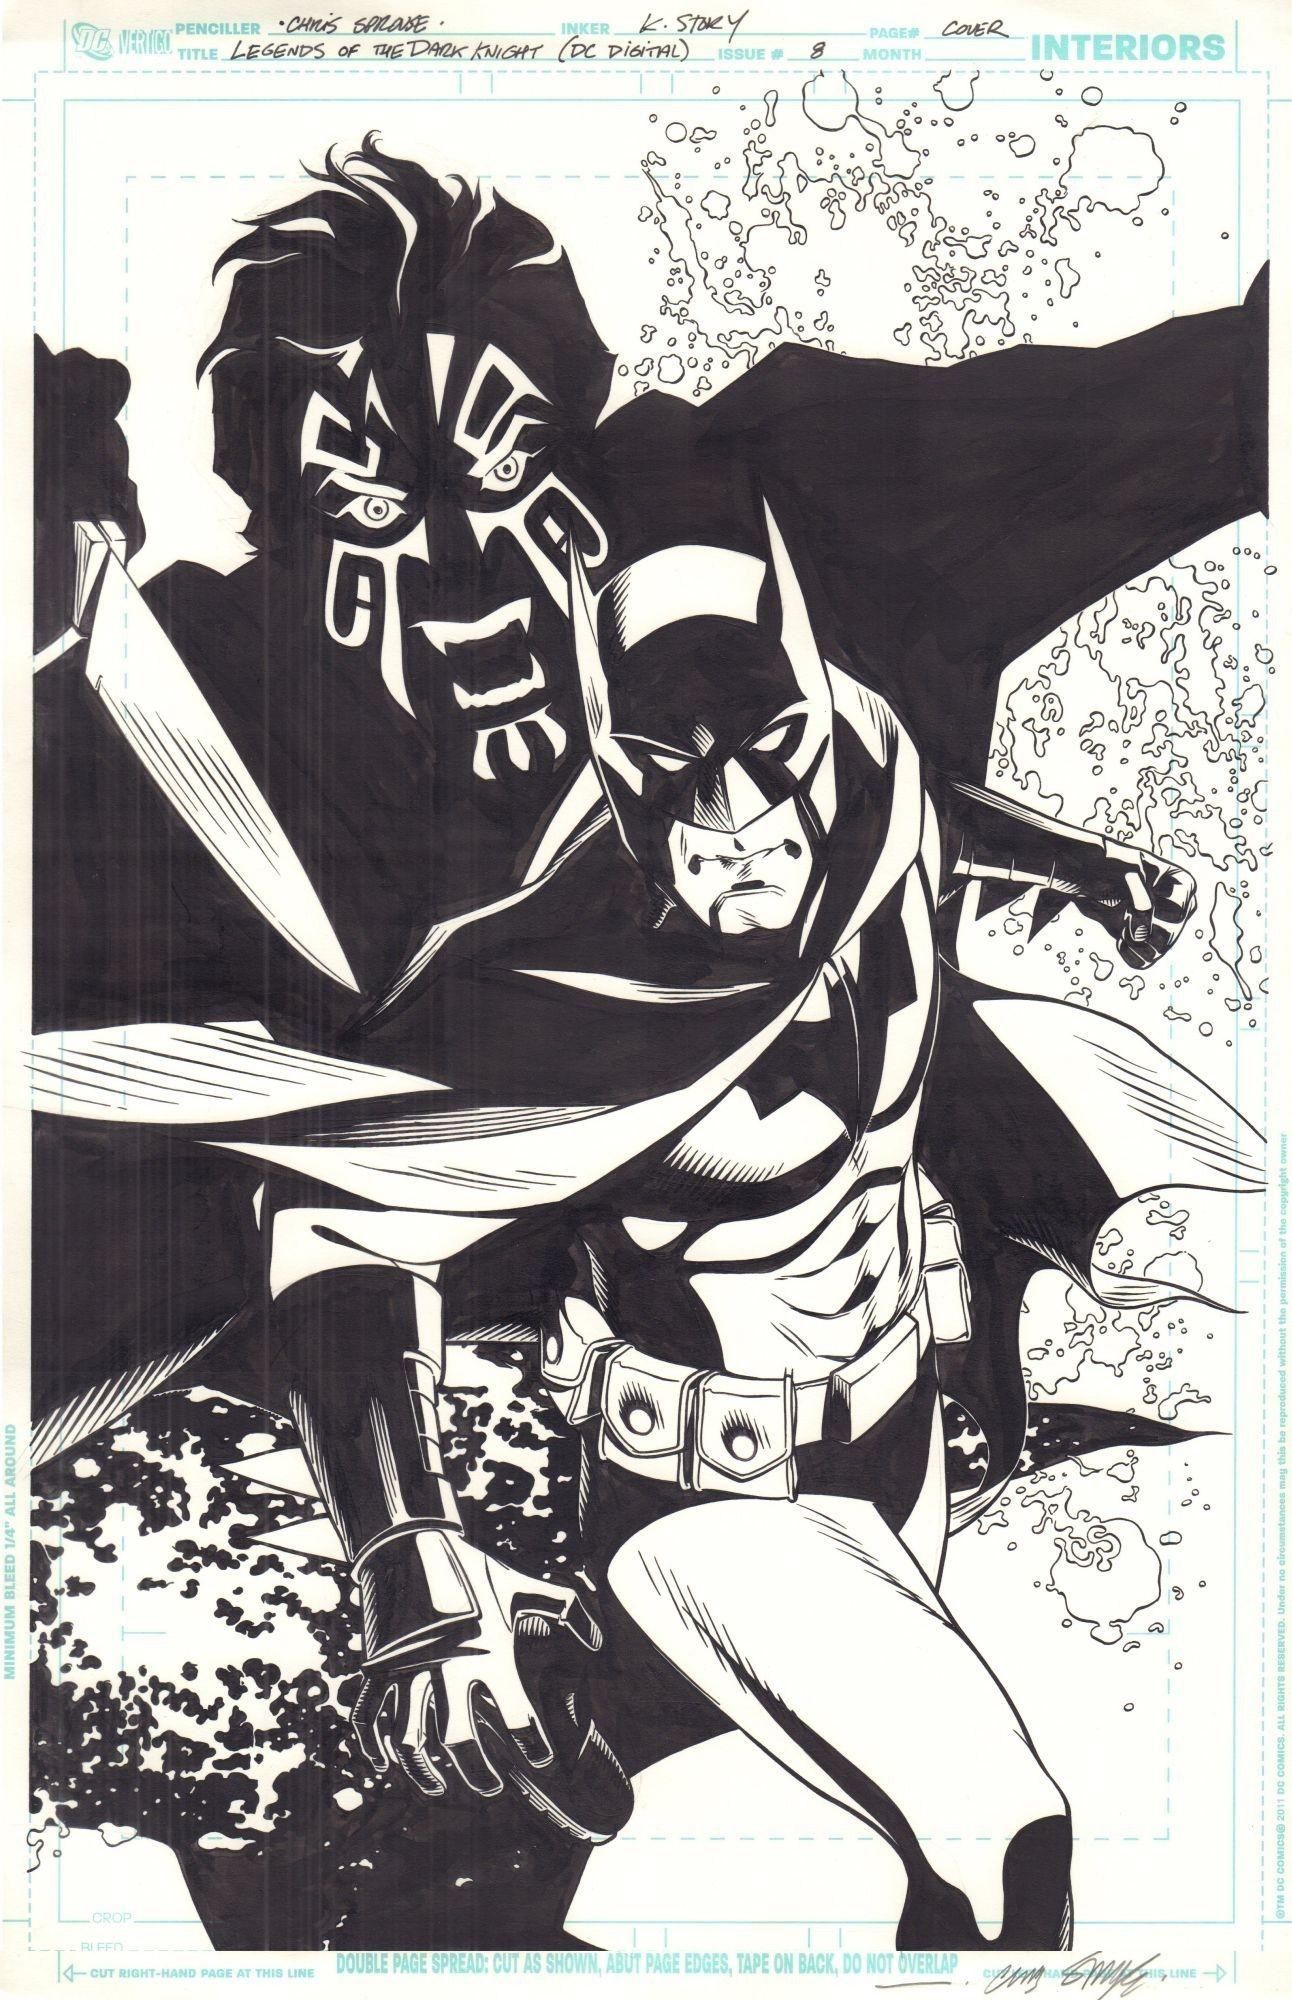 Legends of the Dark Knight #10 - okładka